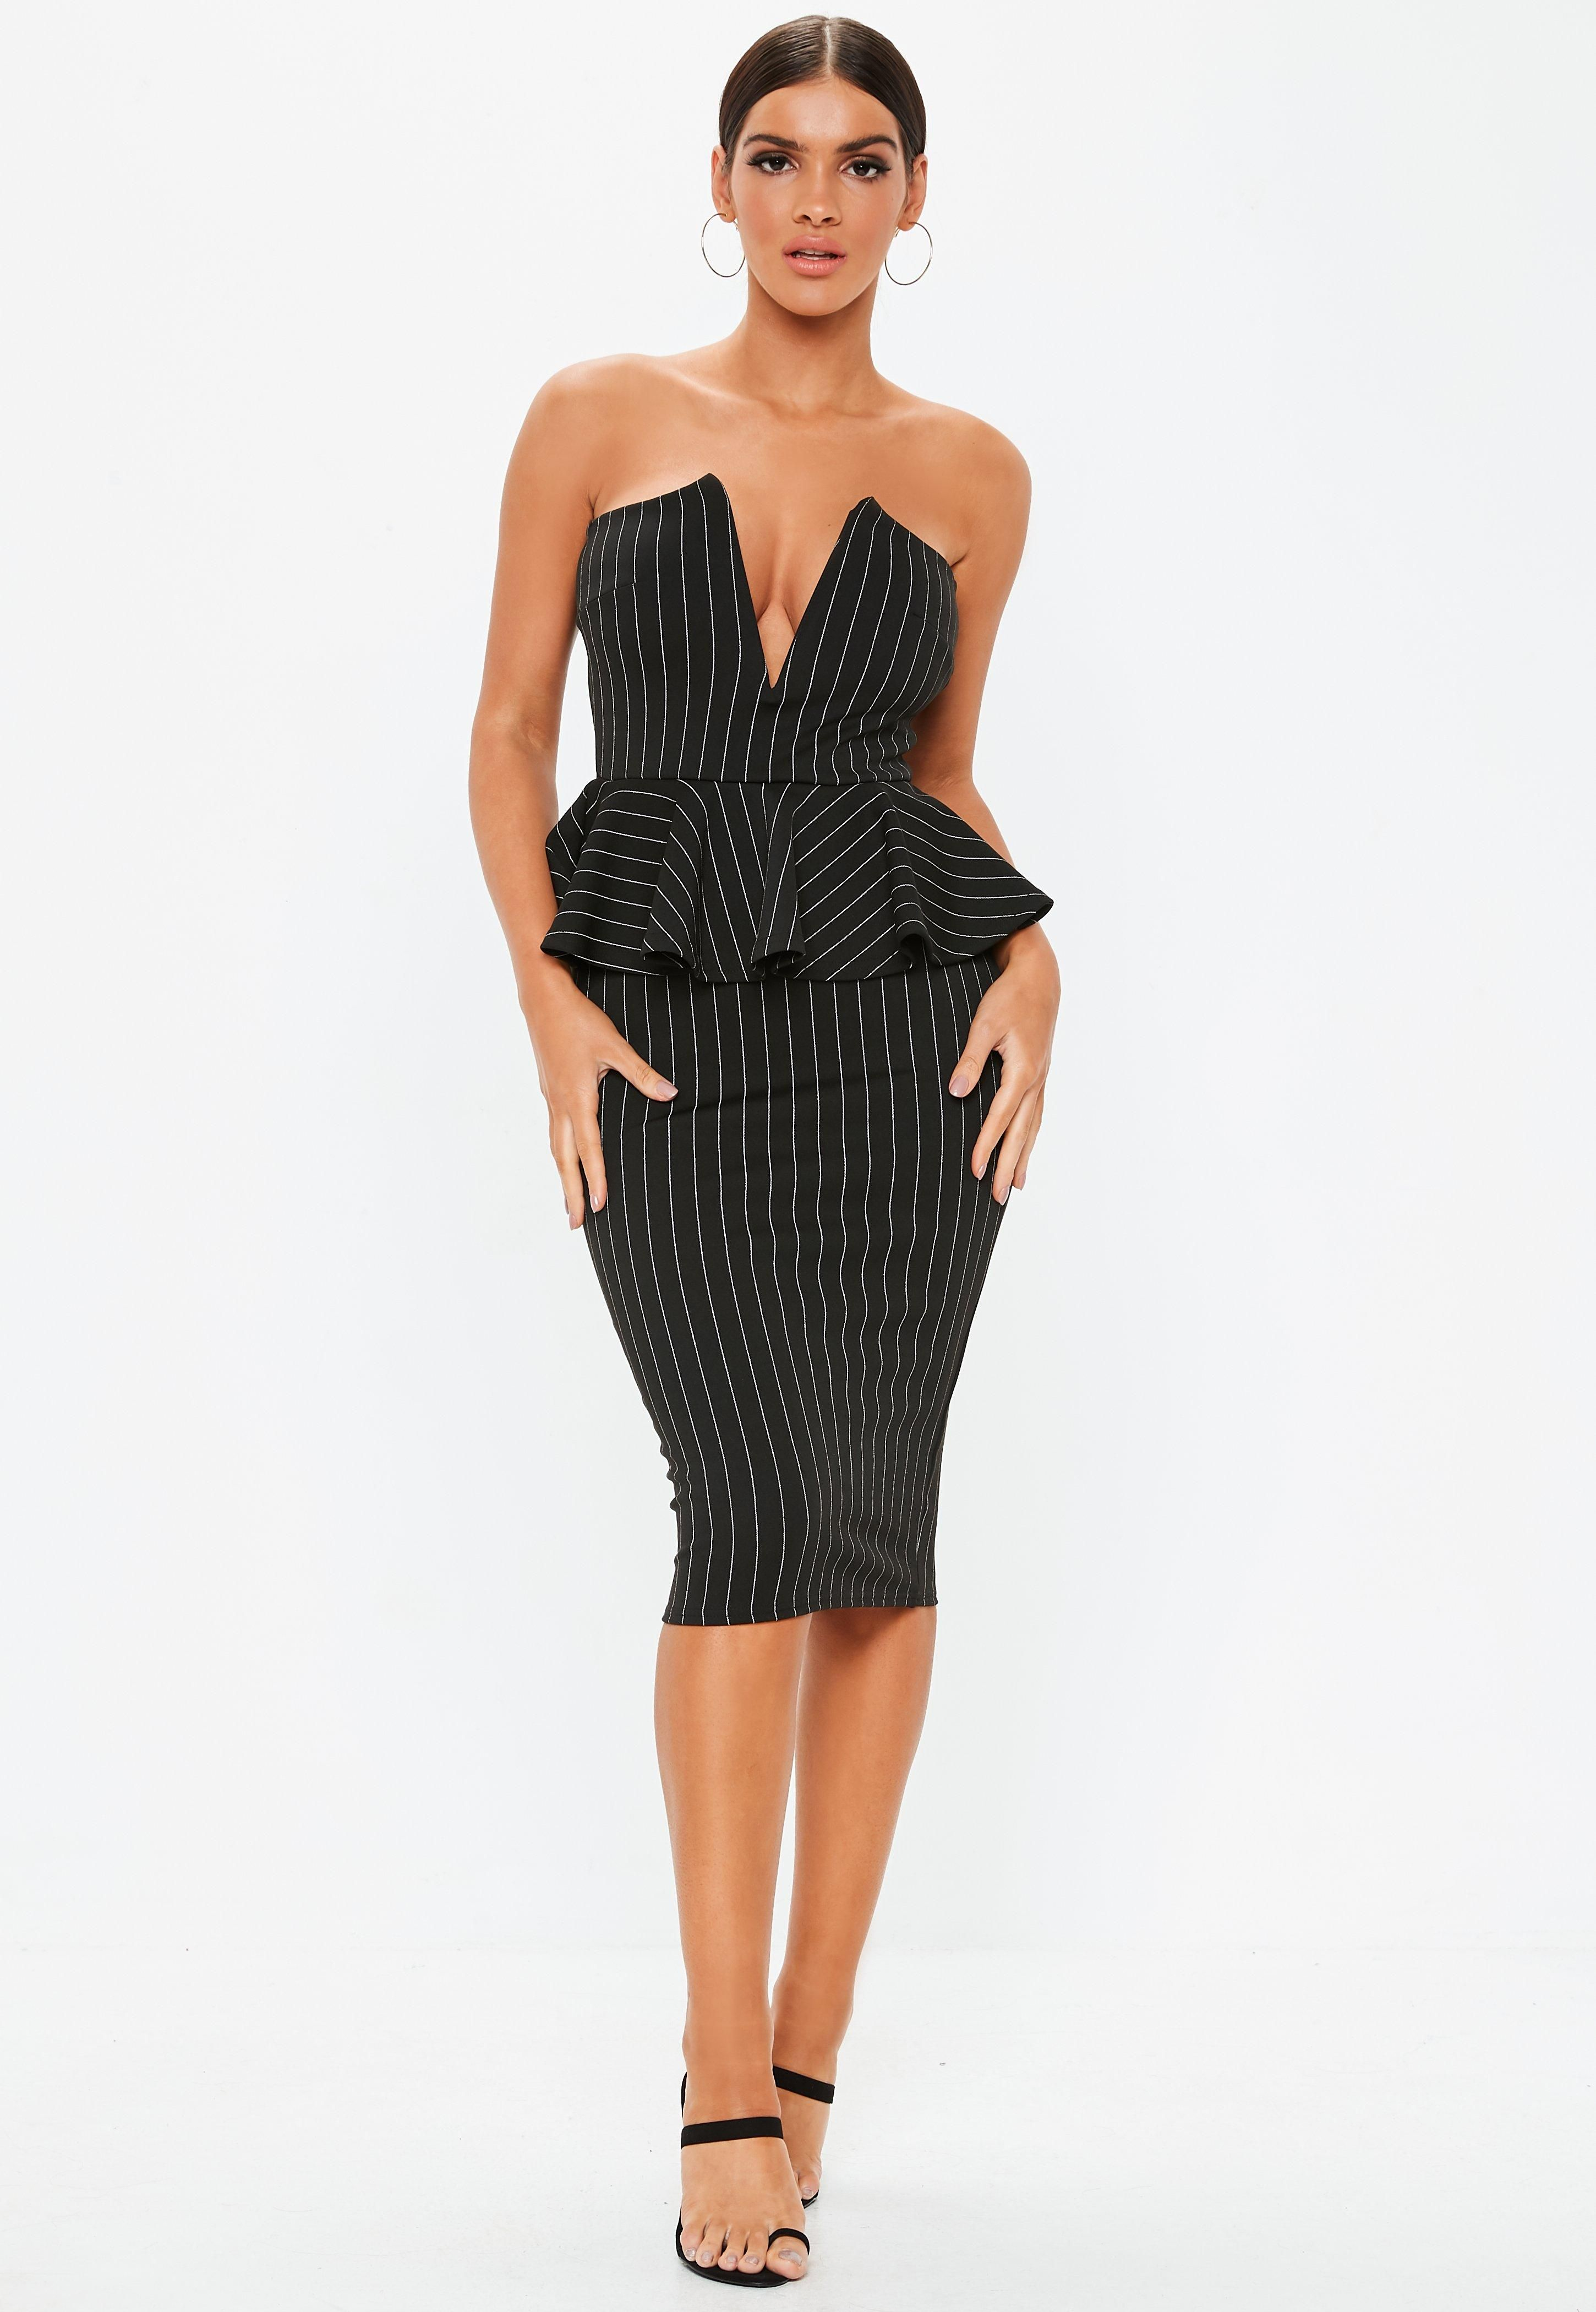 440674772f3 Black Pinstripe Bandeau Peplum Midi Dress in 2019 | Clothes | Peplum ...